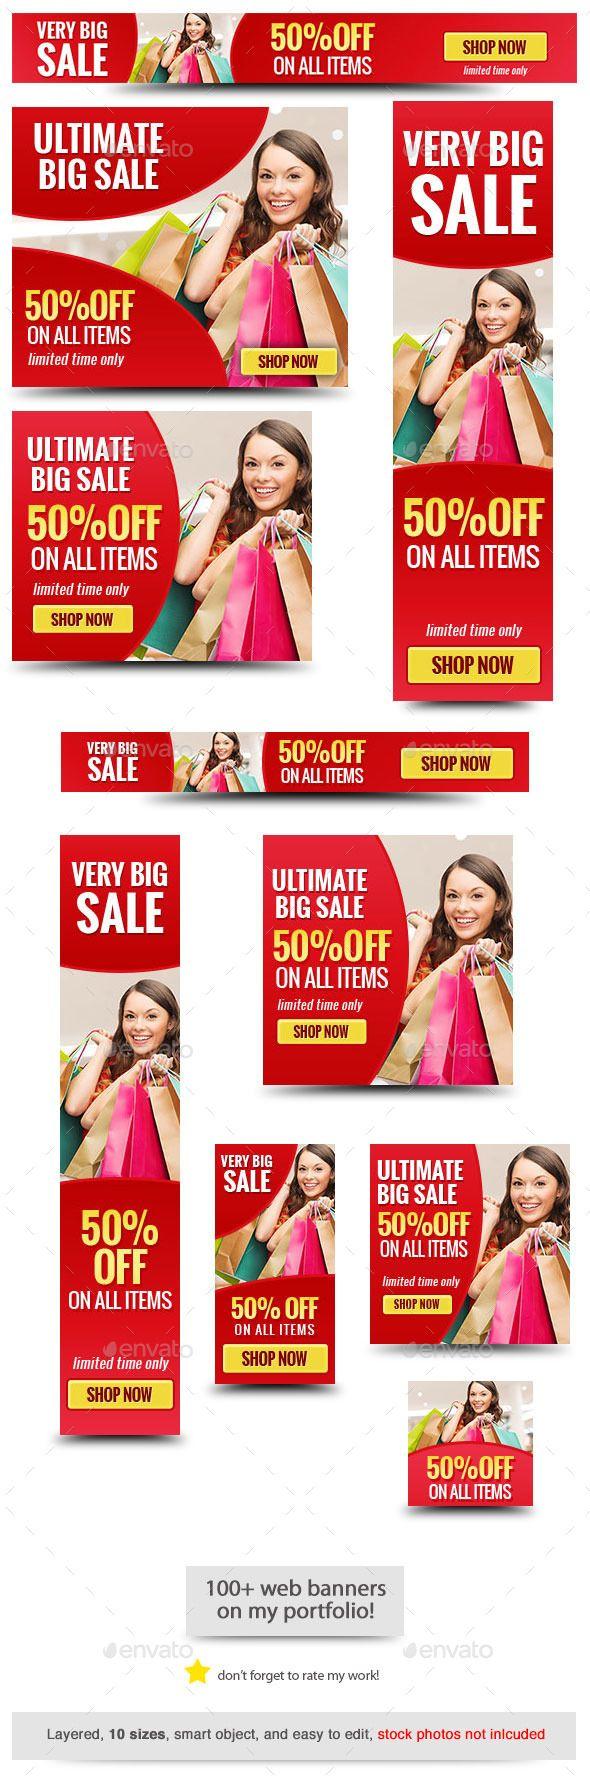 Big Red Sale Banner Template #design #web #ads Download: http://graphicriver.net/item/big-red-sale-banner-template/12650833?ref=ksioks